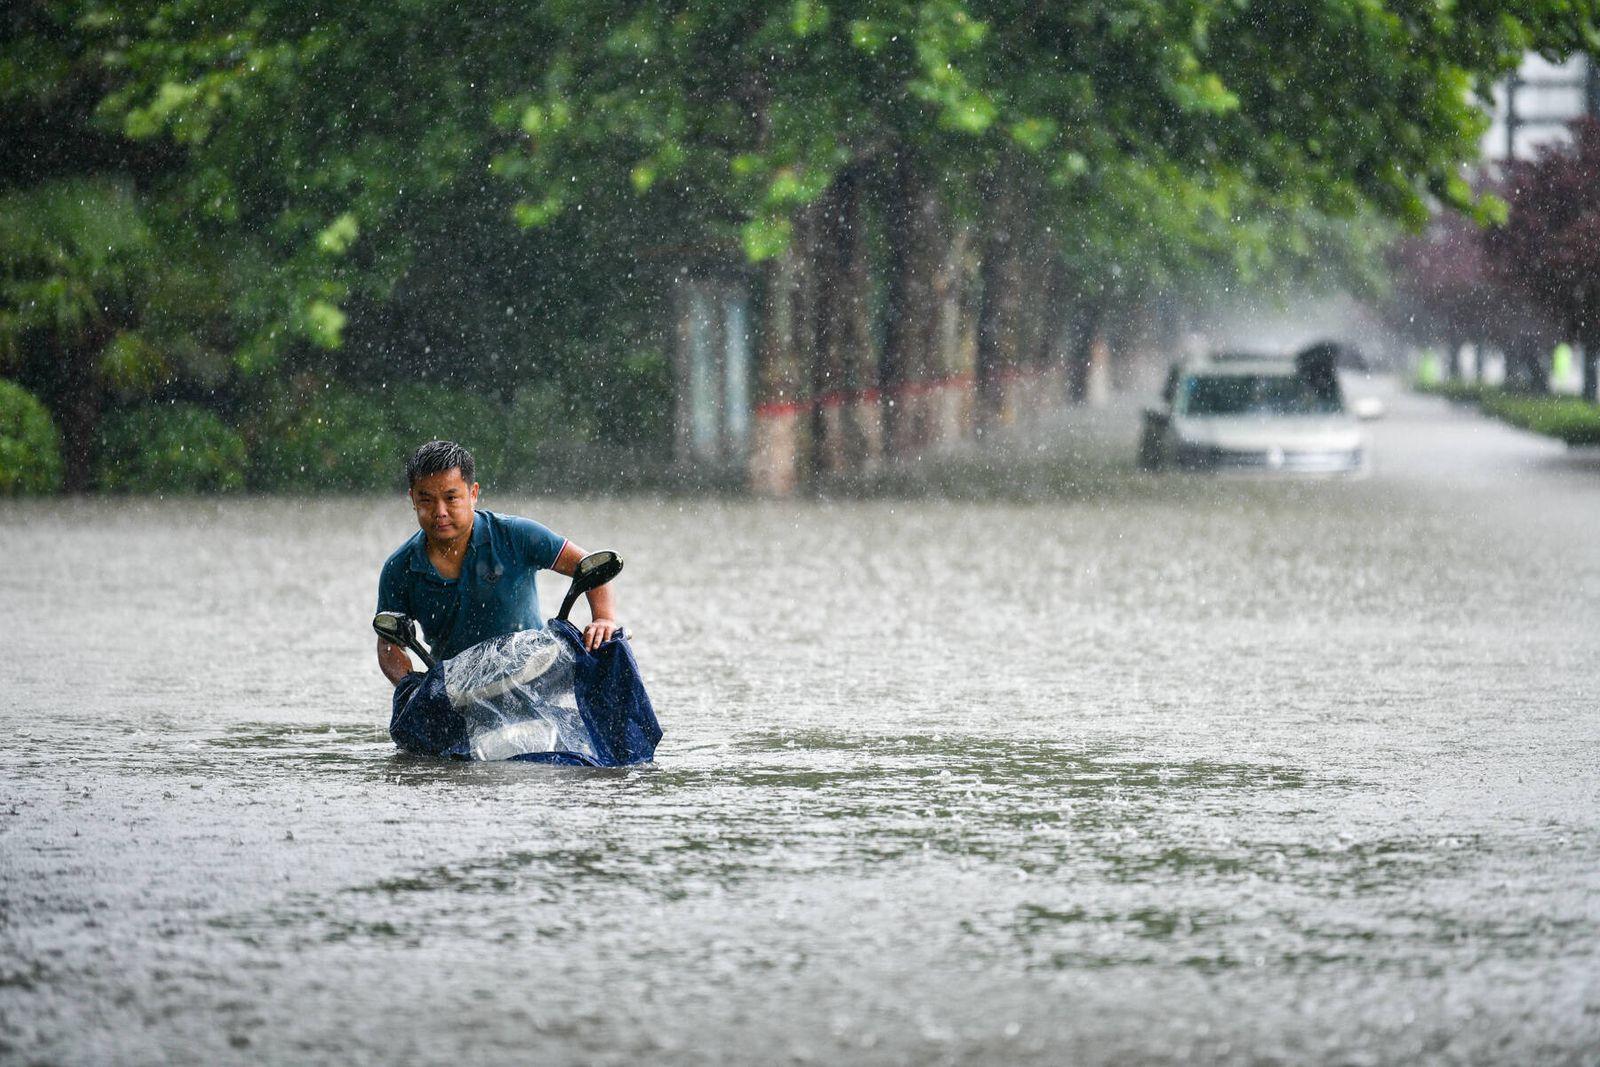 (210720) -- ZHENGZHOU, July 20, 2021 -- A man rides on a waterlogged road in Zhengzhou, capital of central China s Hena